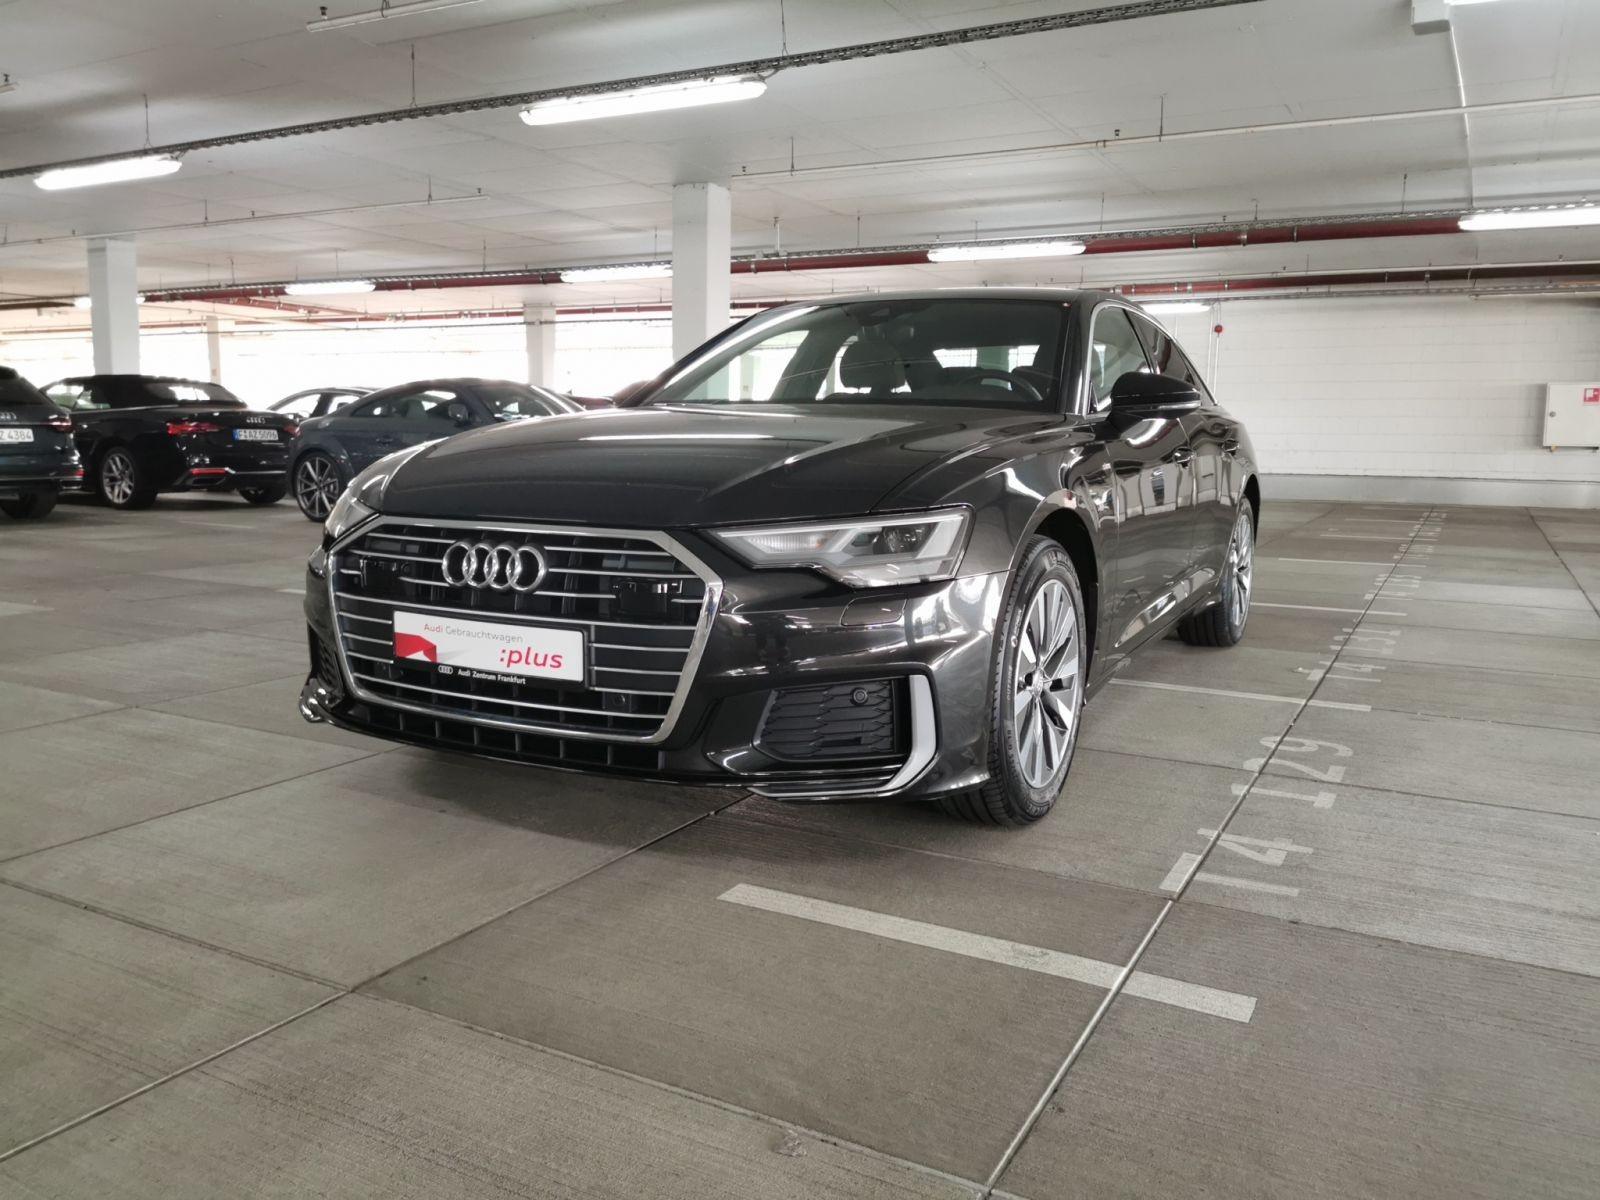 Audi A6 40 TDI S tronic S line AHK Navi LED PDC Sitzheizung, Jahr 2019, Diesel